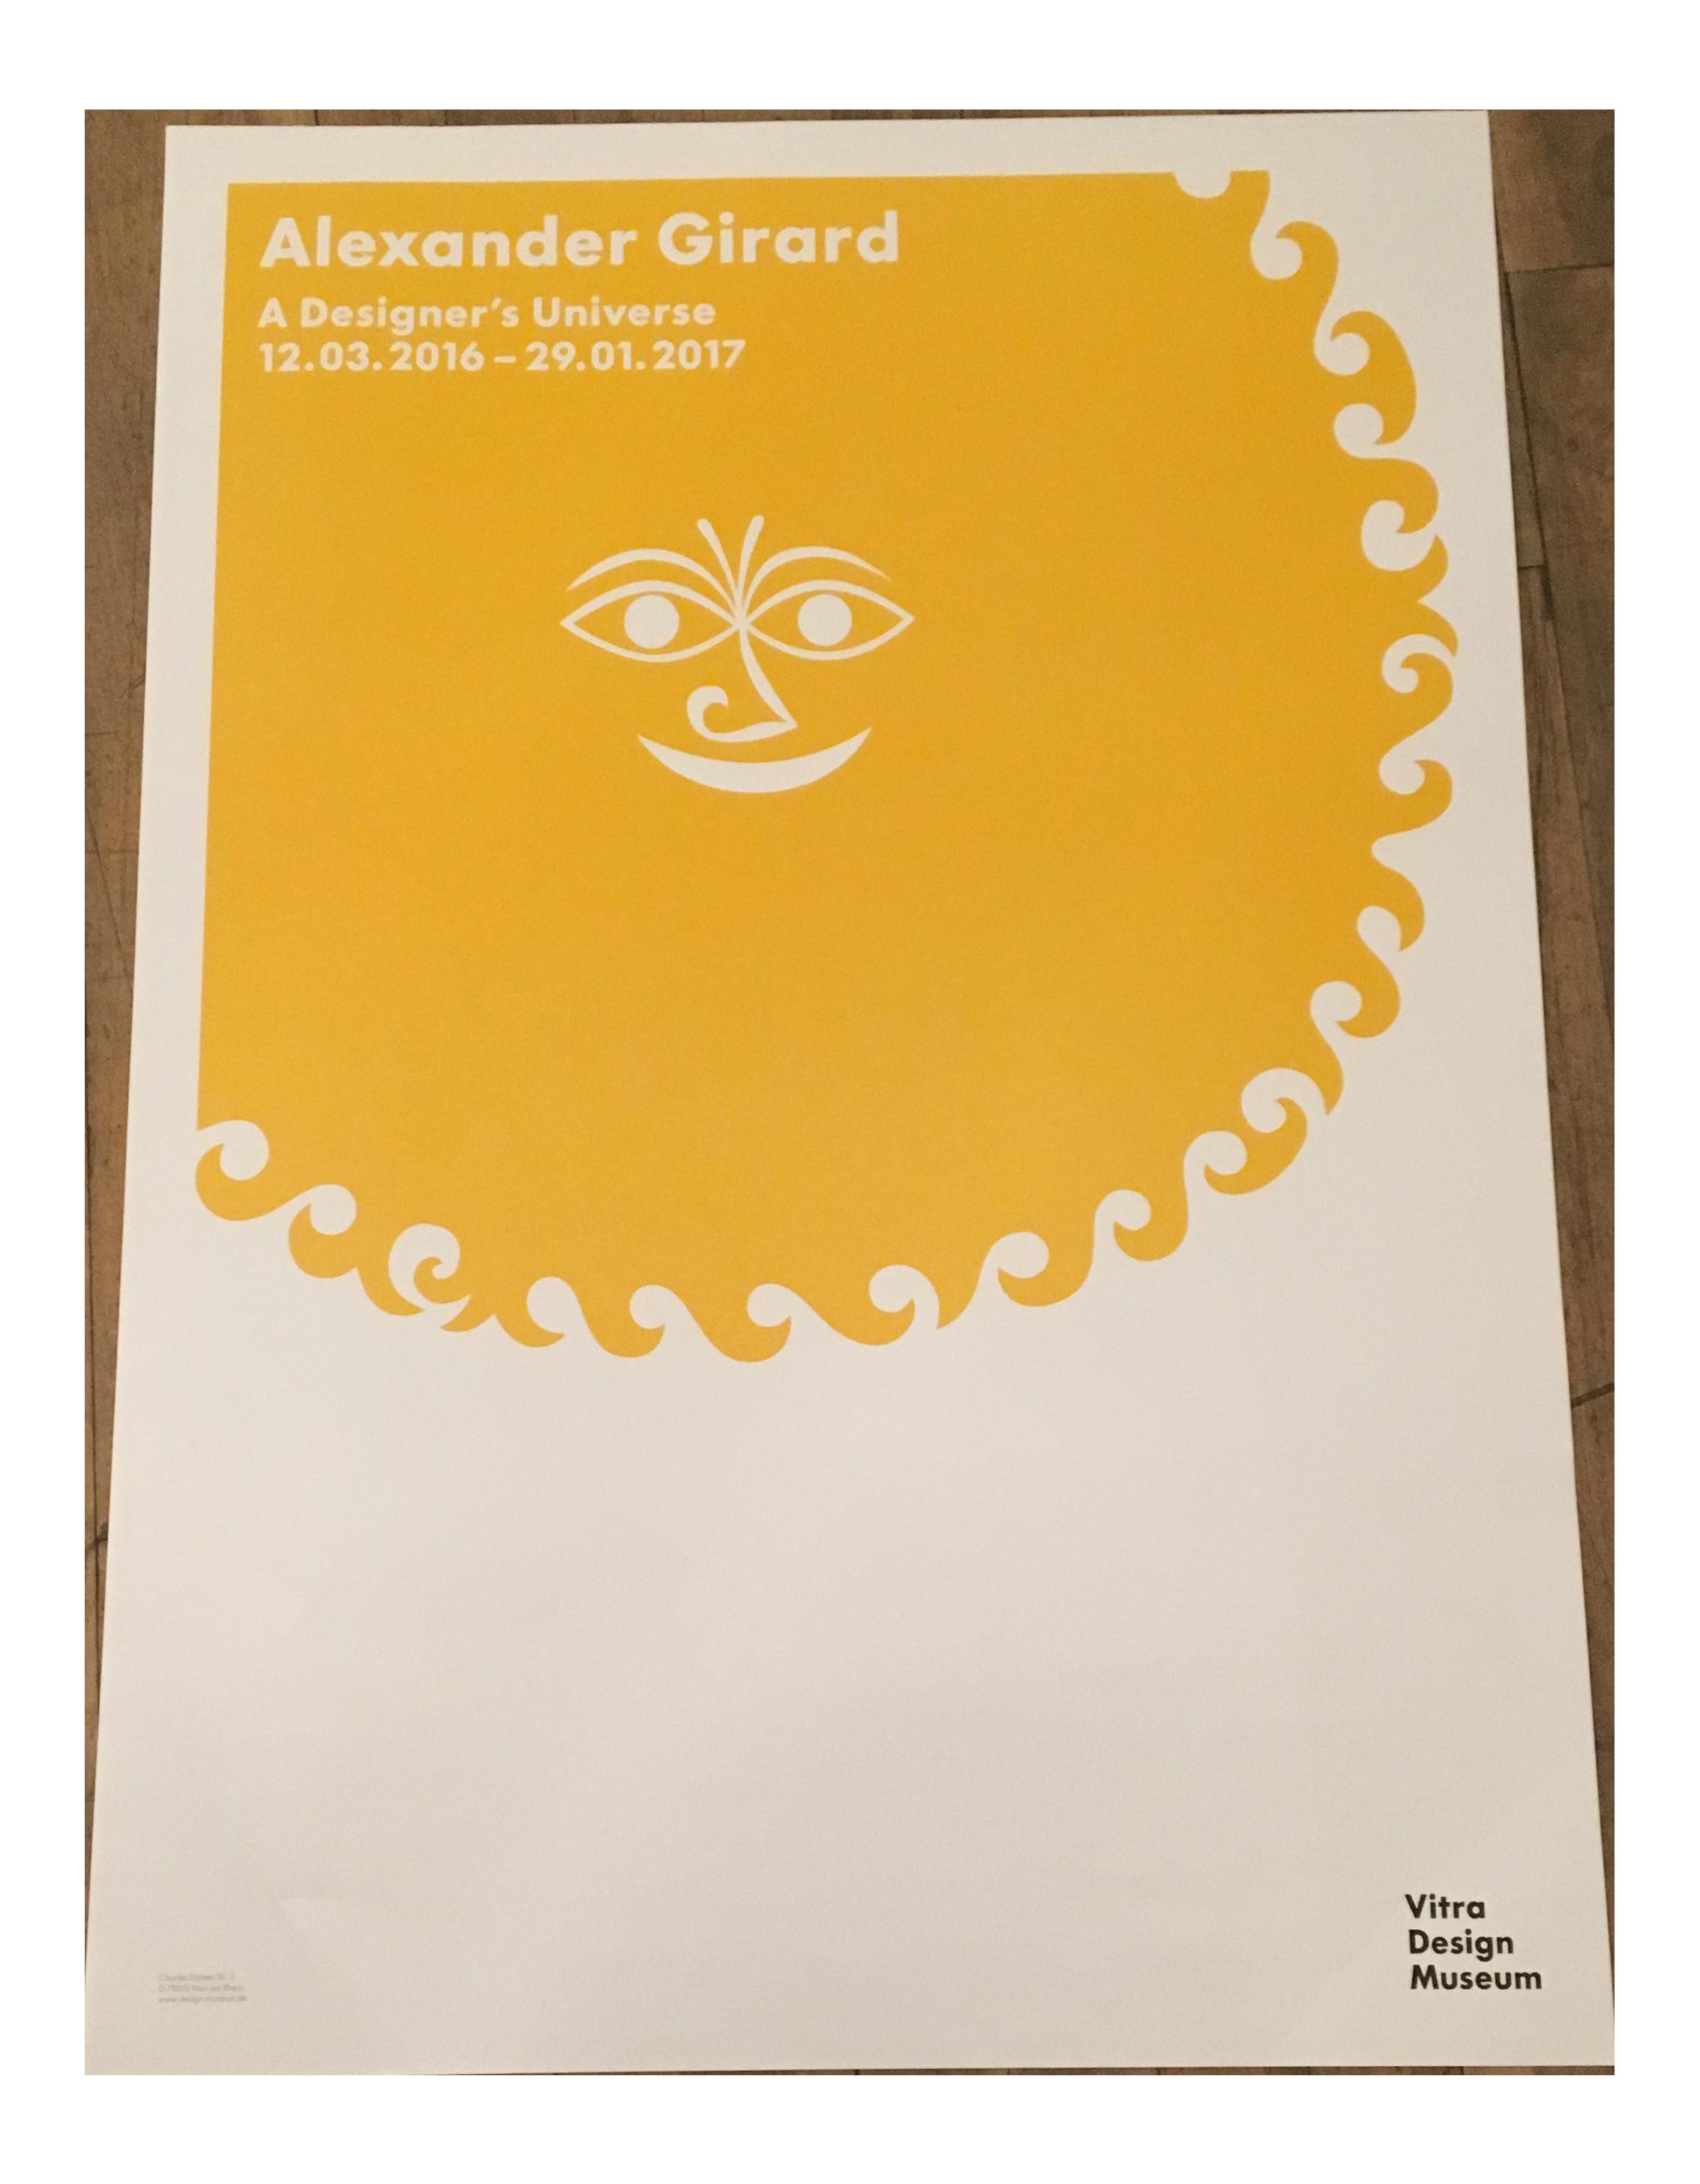 Poster vitra design museum - Poster Vitra Design Museum 31